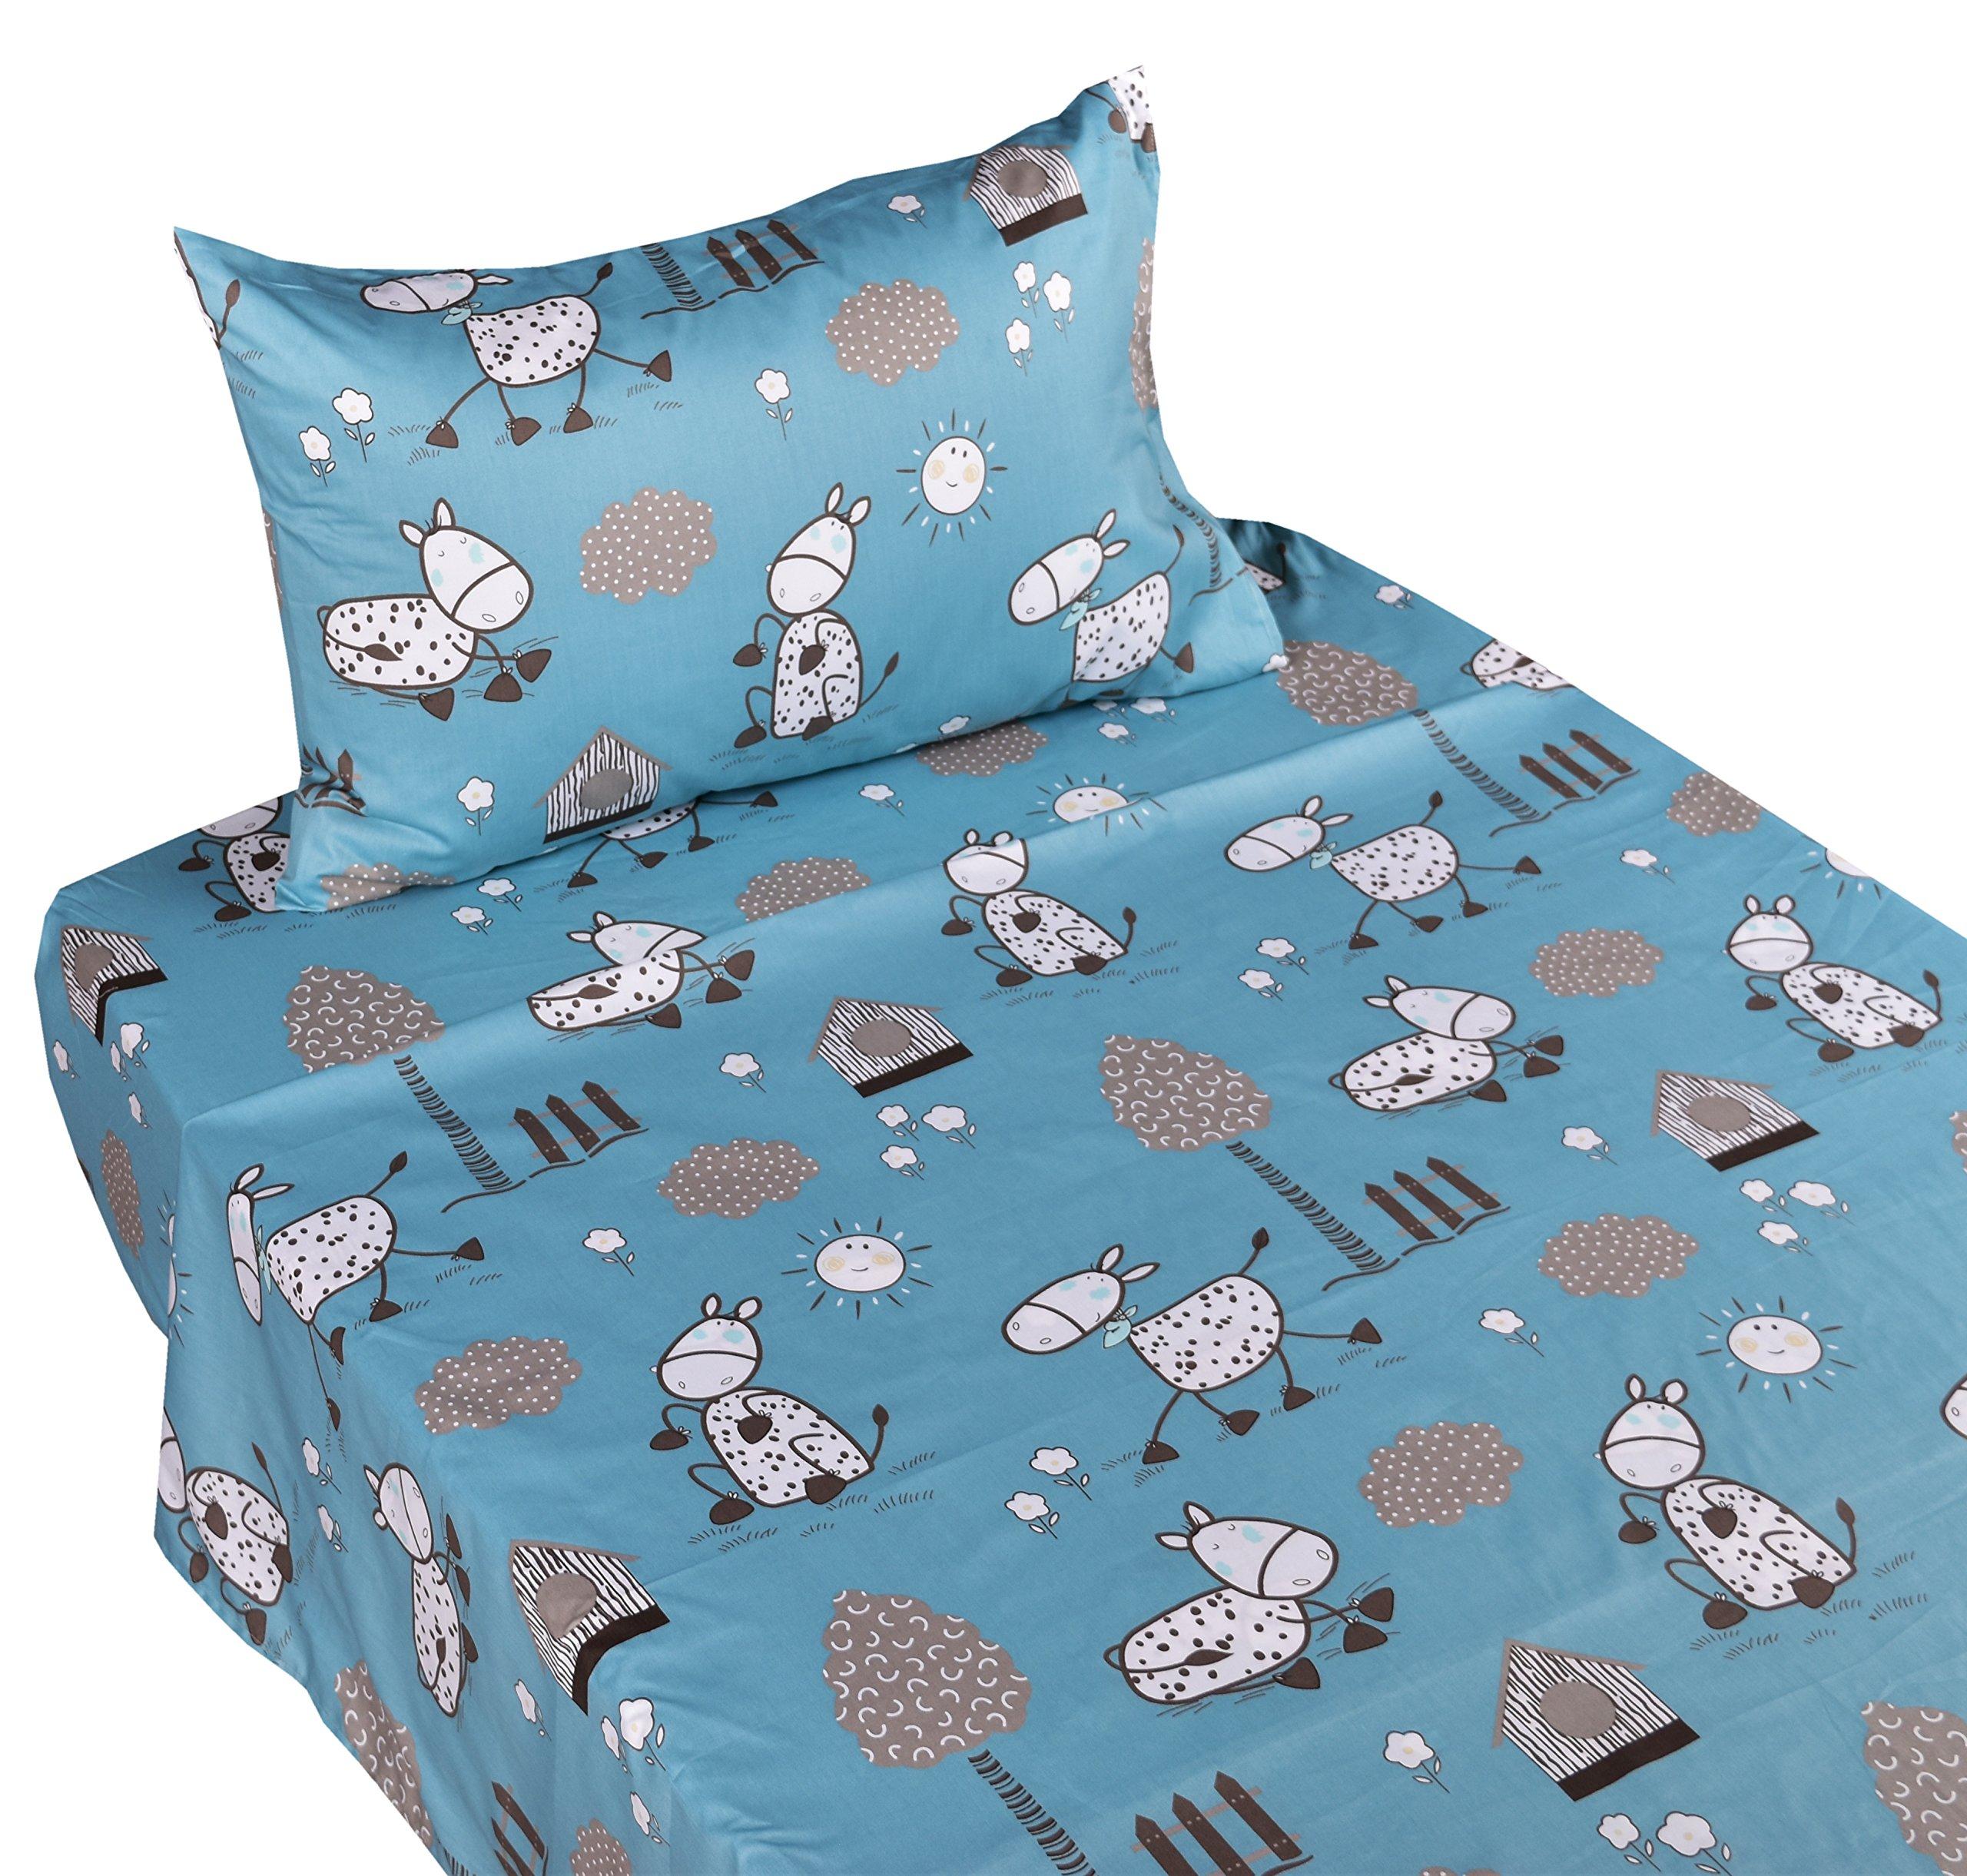 J-pinno Happy Donkey or Sheep Twin Sheet Set for Kids Boy Children,100% Cotton, Flat Sheet + Fitted Sheet + Pillowcase Bedding Set